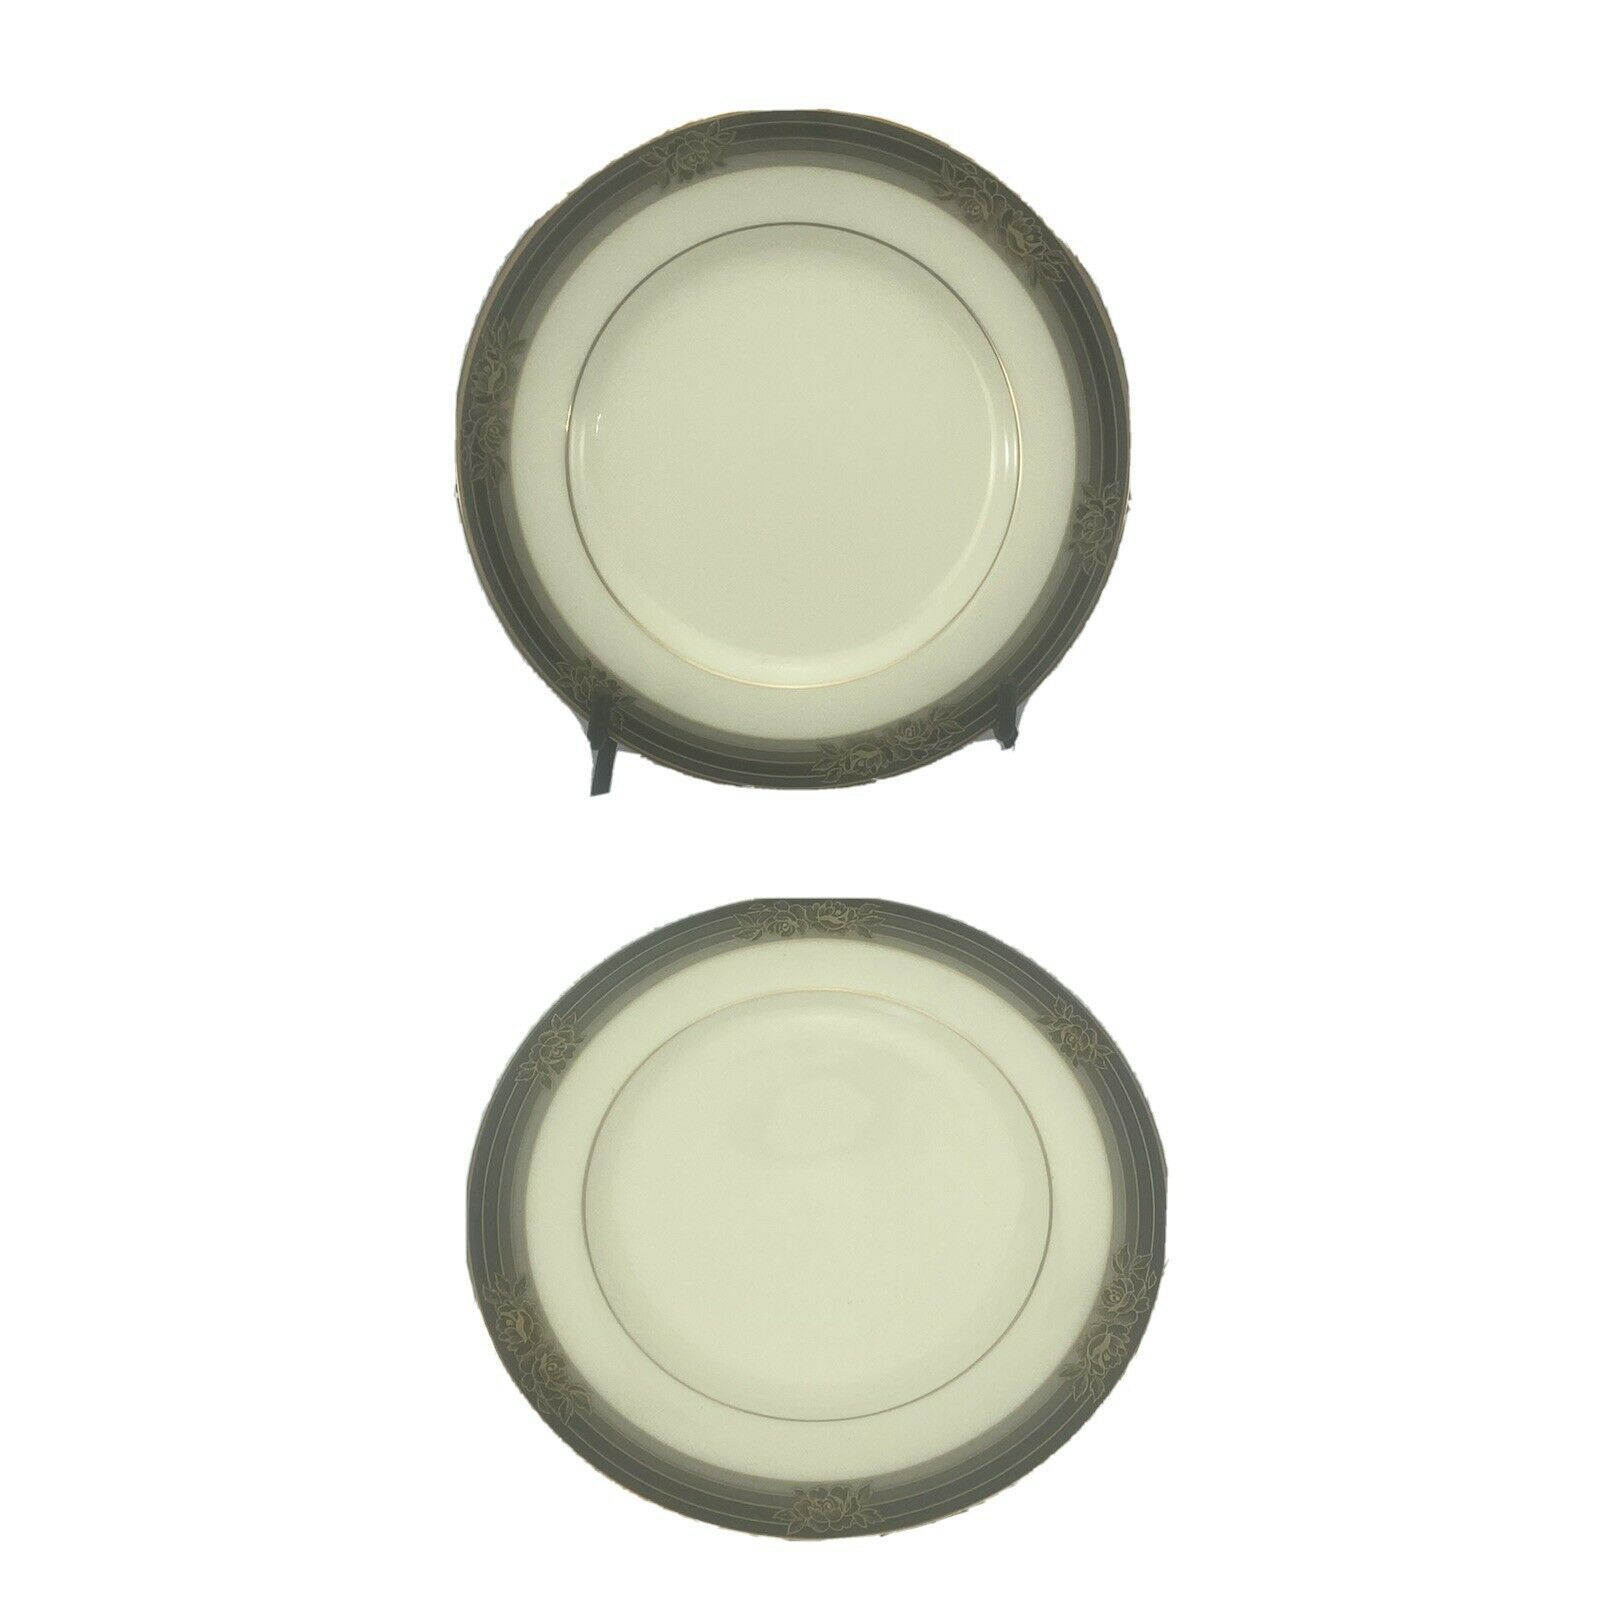 "SET 2 NORITAKE SPELL BINDER BREAD DESSERT PLATE  BONE CHINA  6 1/2""  #9733 japan - $24.74"